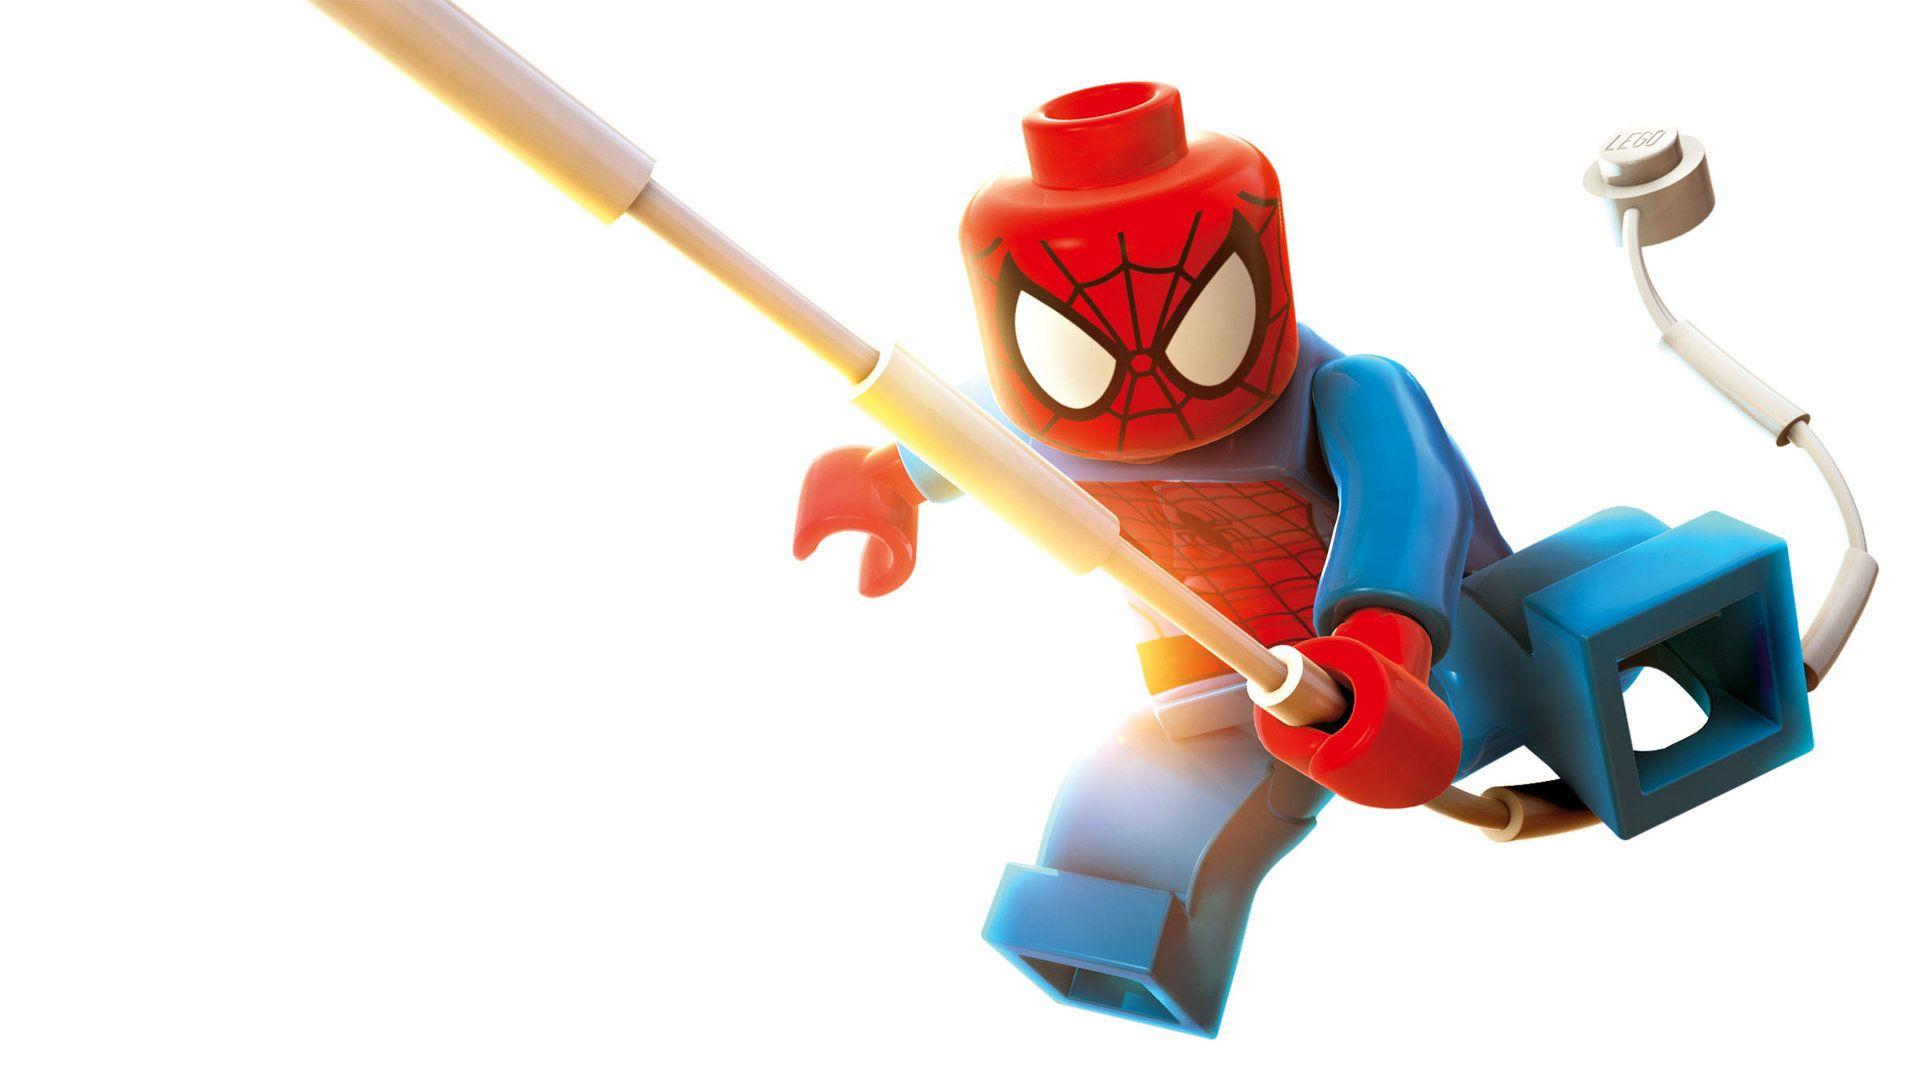 Lego marvel spiderman cool wallpaper hdg 19201080 awesome lego marvel spiderman cool wallpaper hdg 1920 lego marvel voltagebd Images